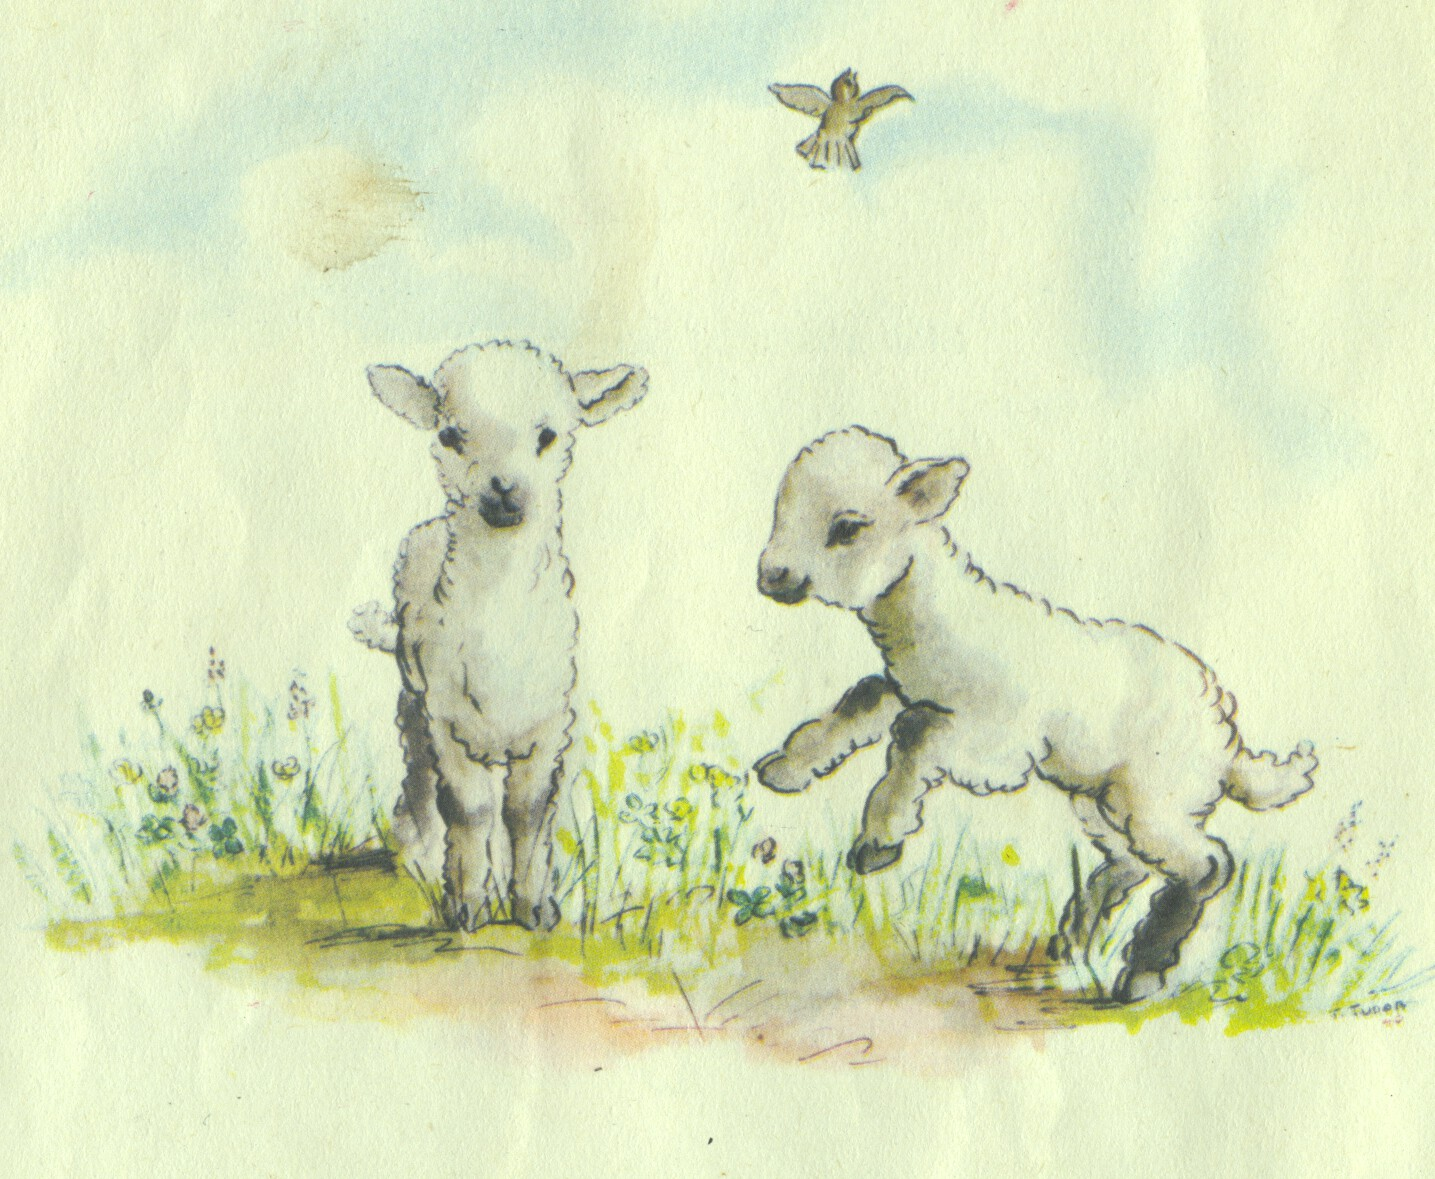 Lambs illustration by Tasha Tudor